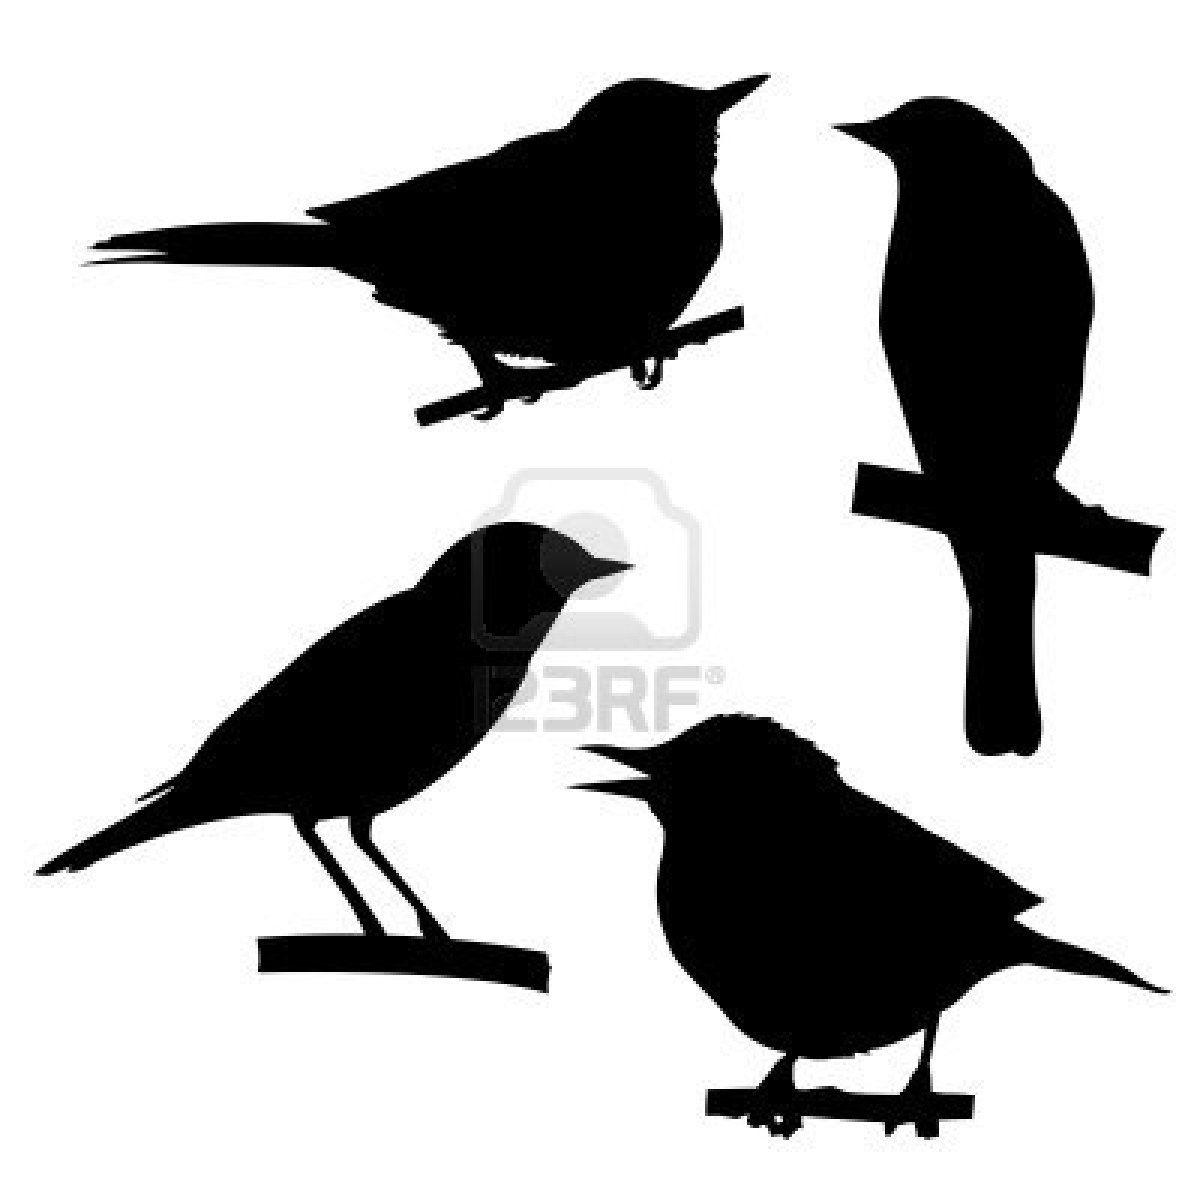 Birds sitting on tree clipart jpg transparent stock Stock Vector | Silhouette | Bird silhouette, Birds, Bird on branch jpg transparent stock